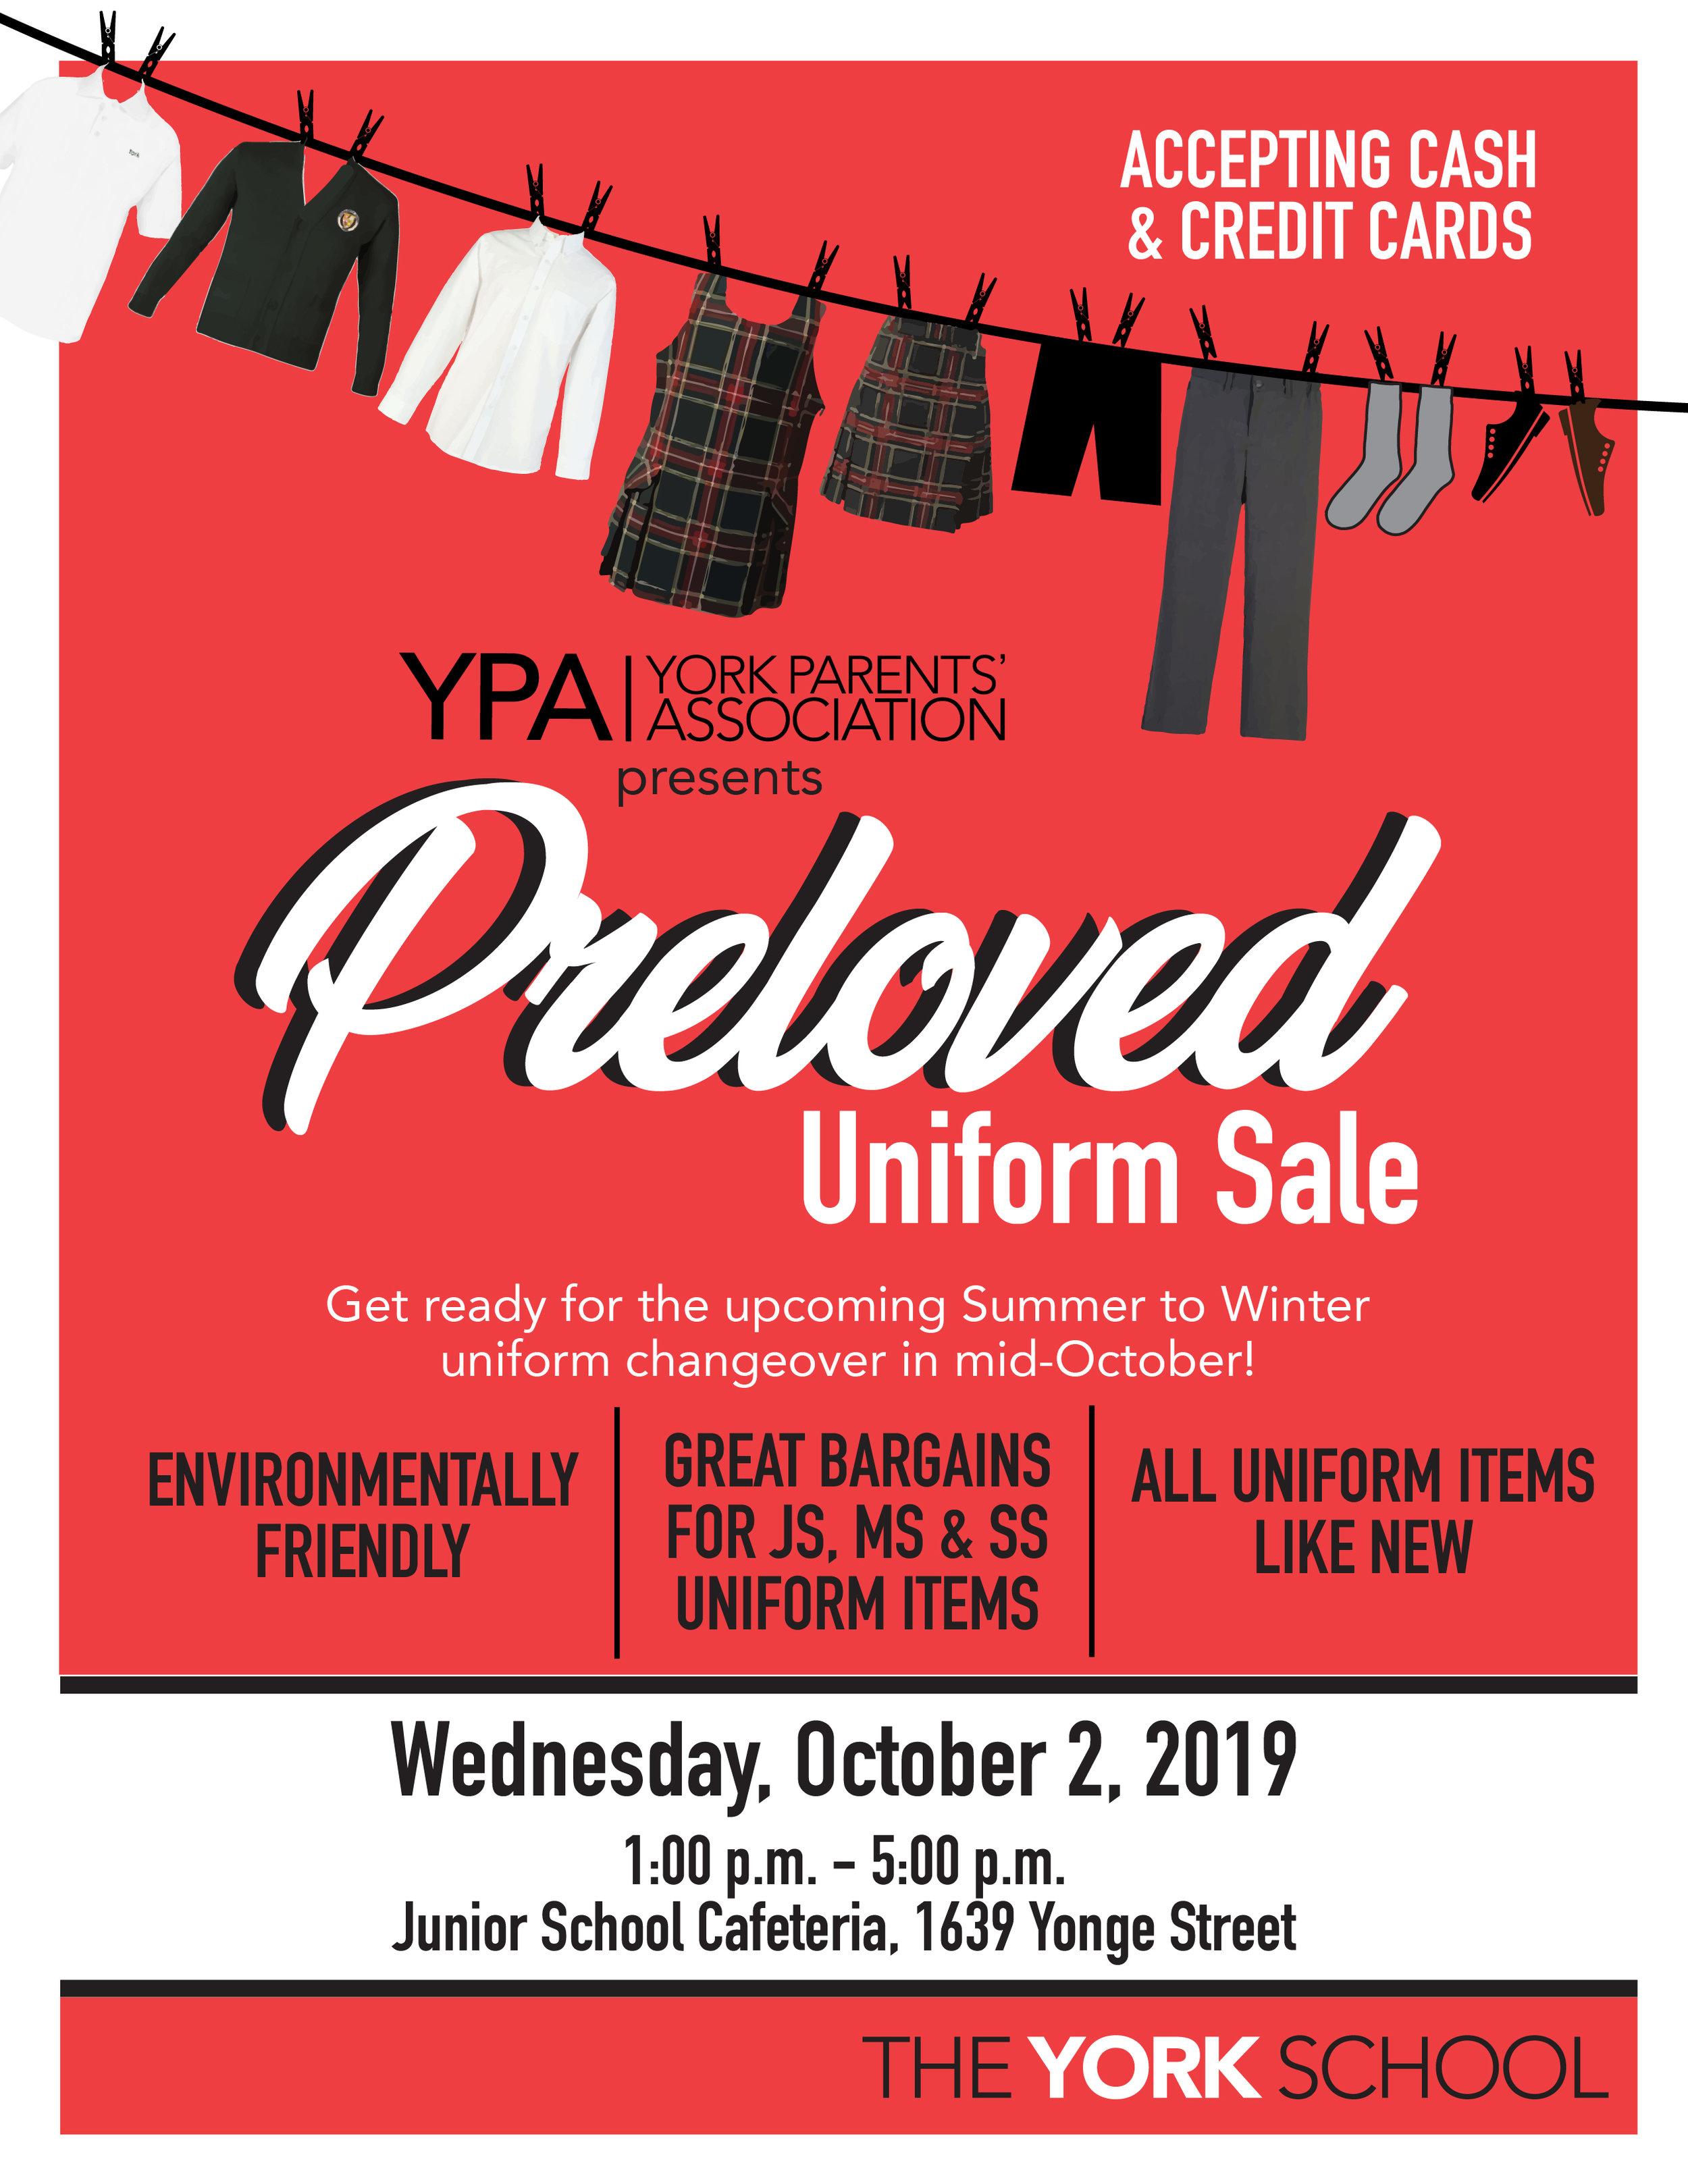 2019-10-02 YPA PreLoved Uniform Sale-01.jpg